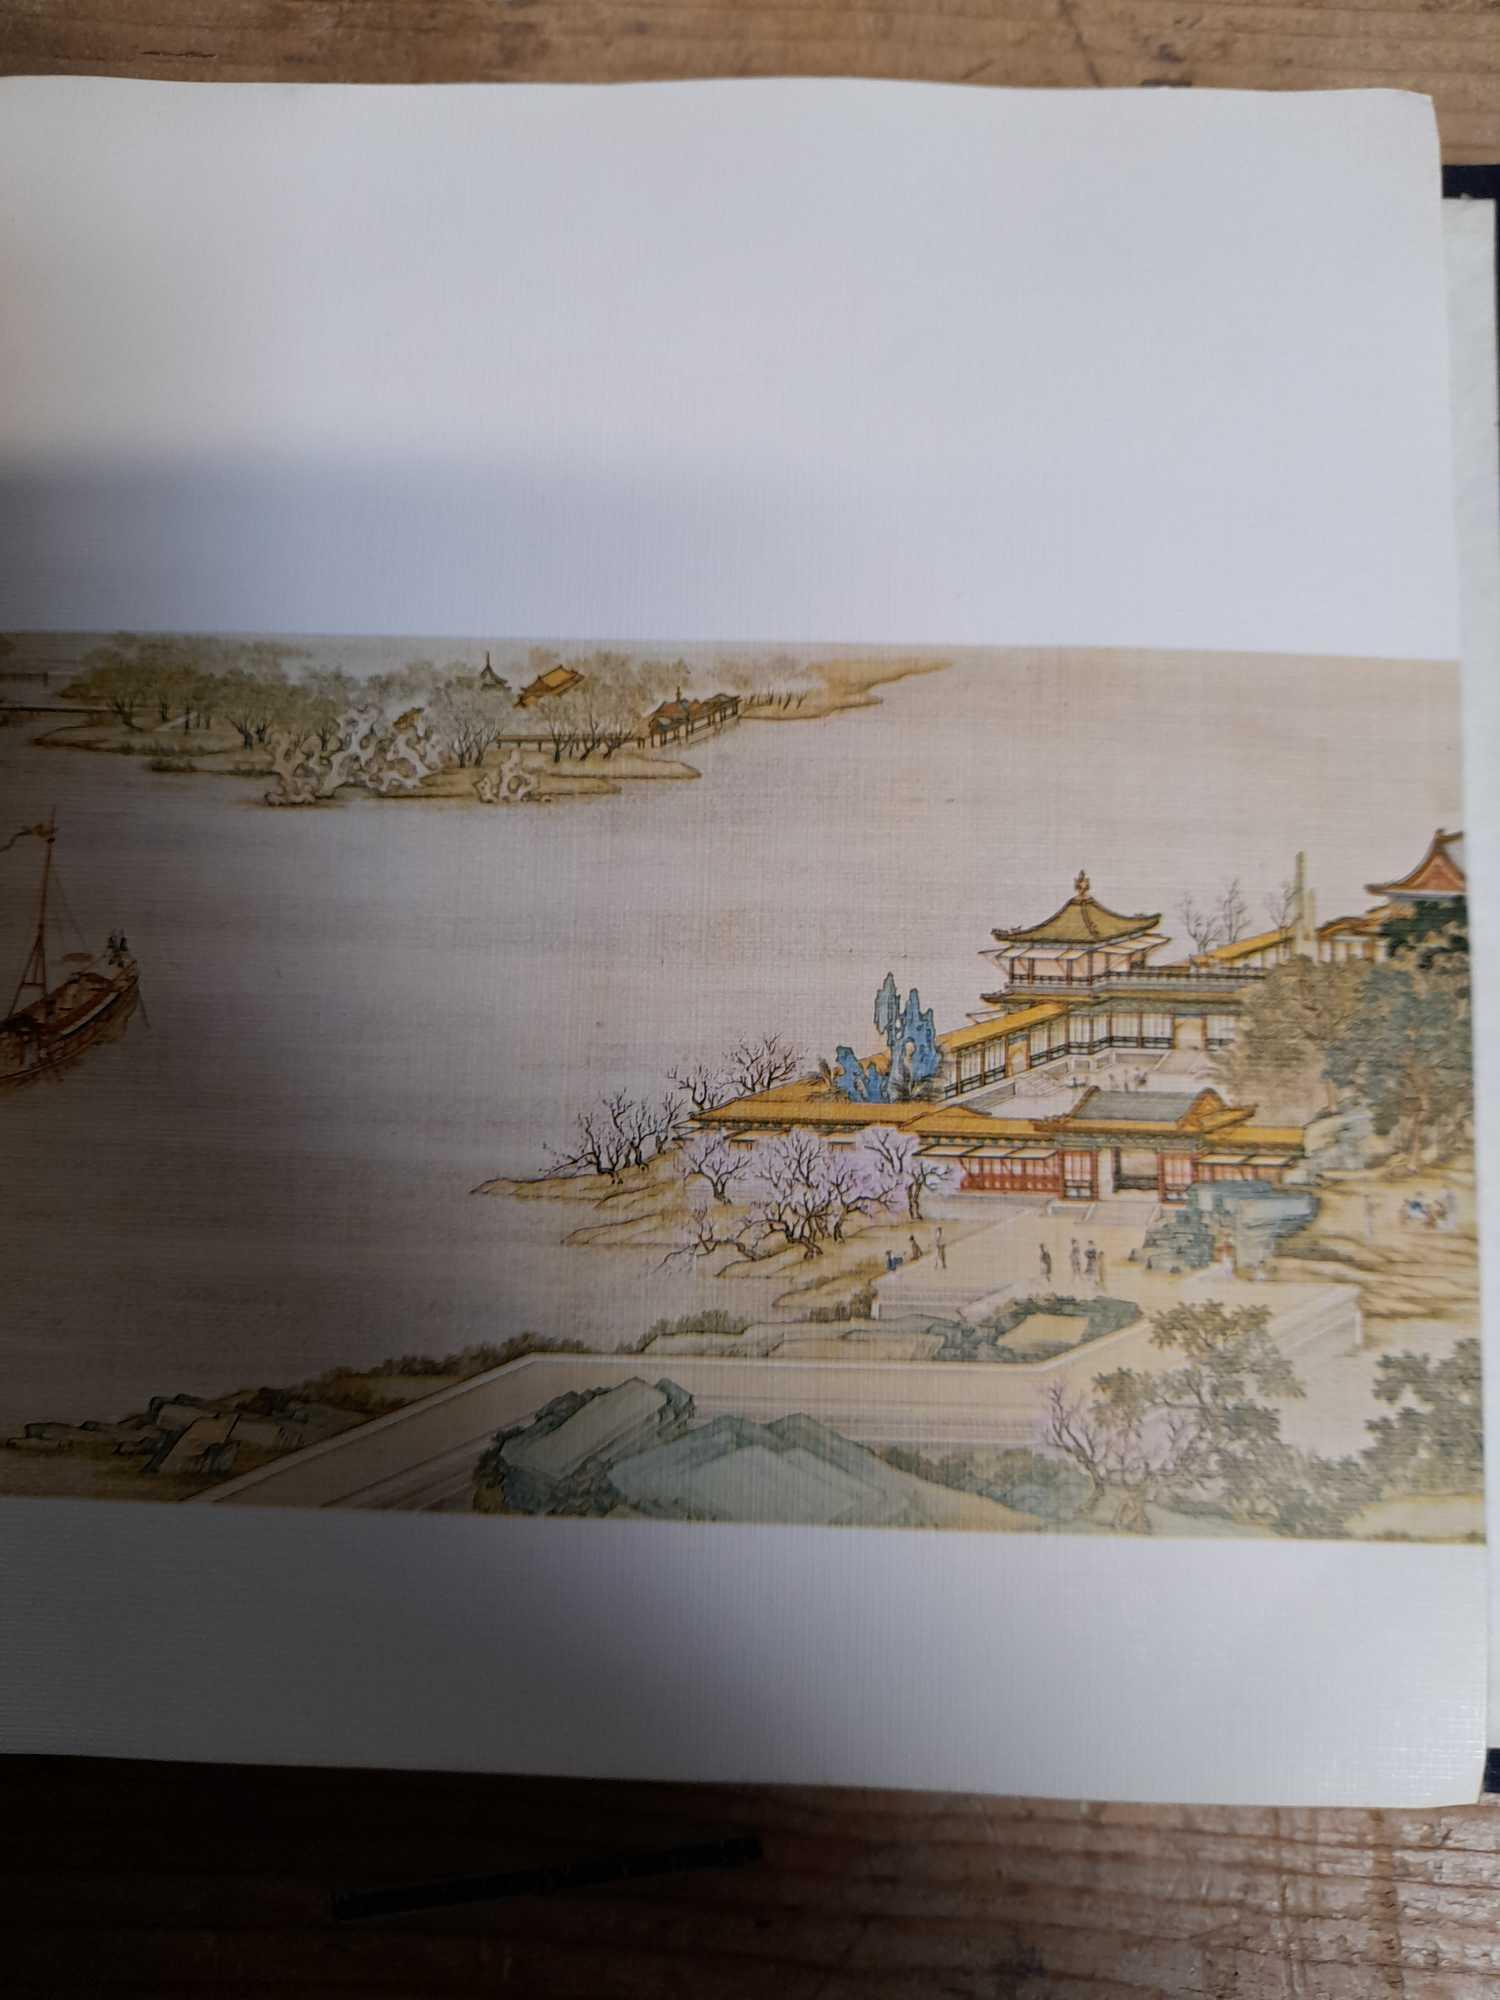 2 ORIENTAL BOOKS - Image 13 of 14